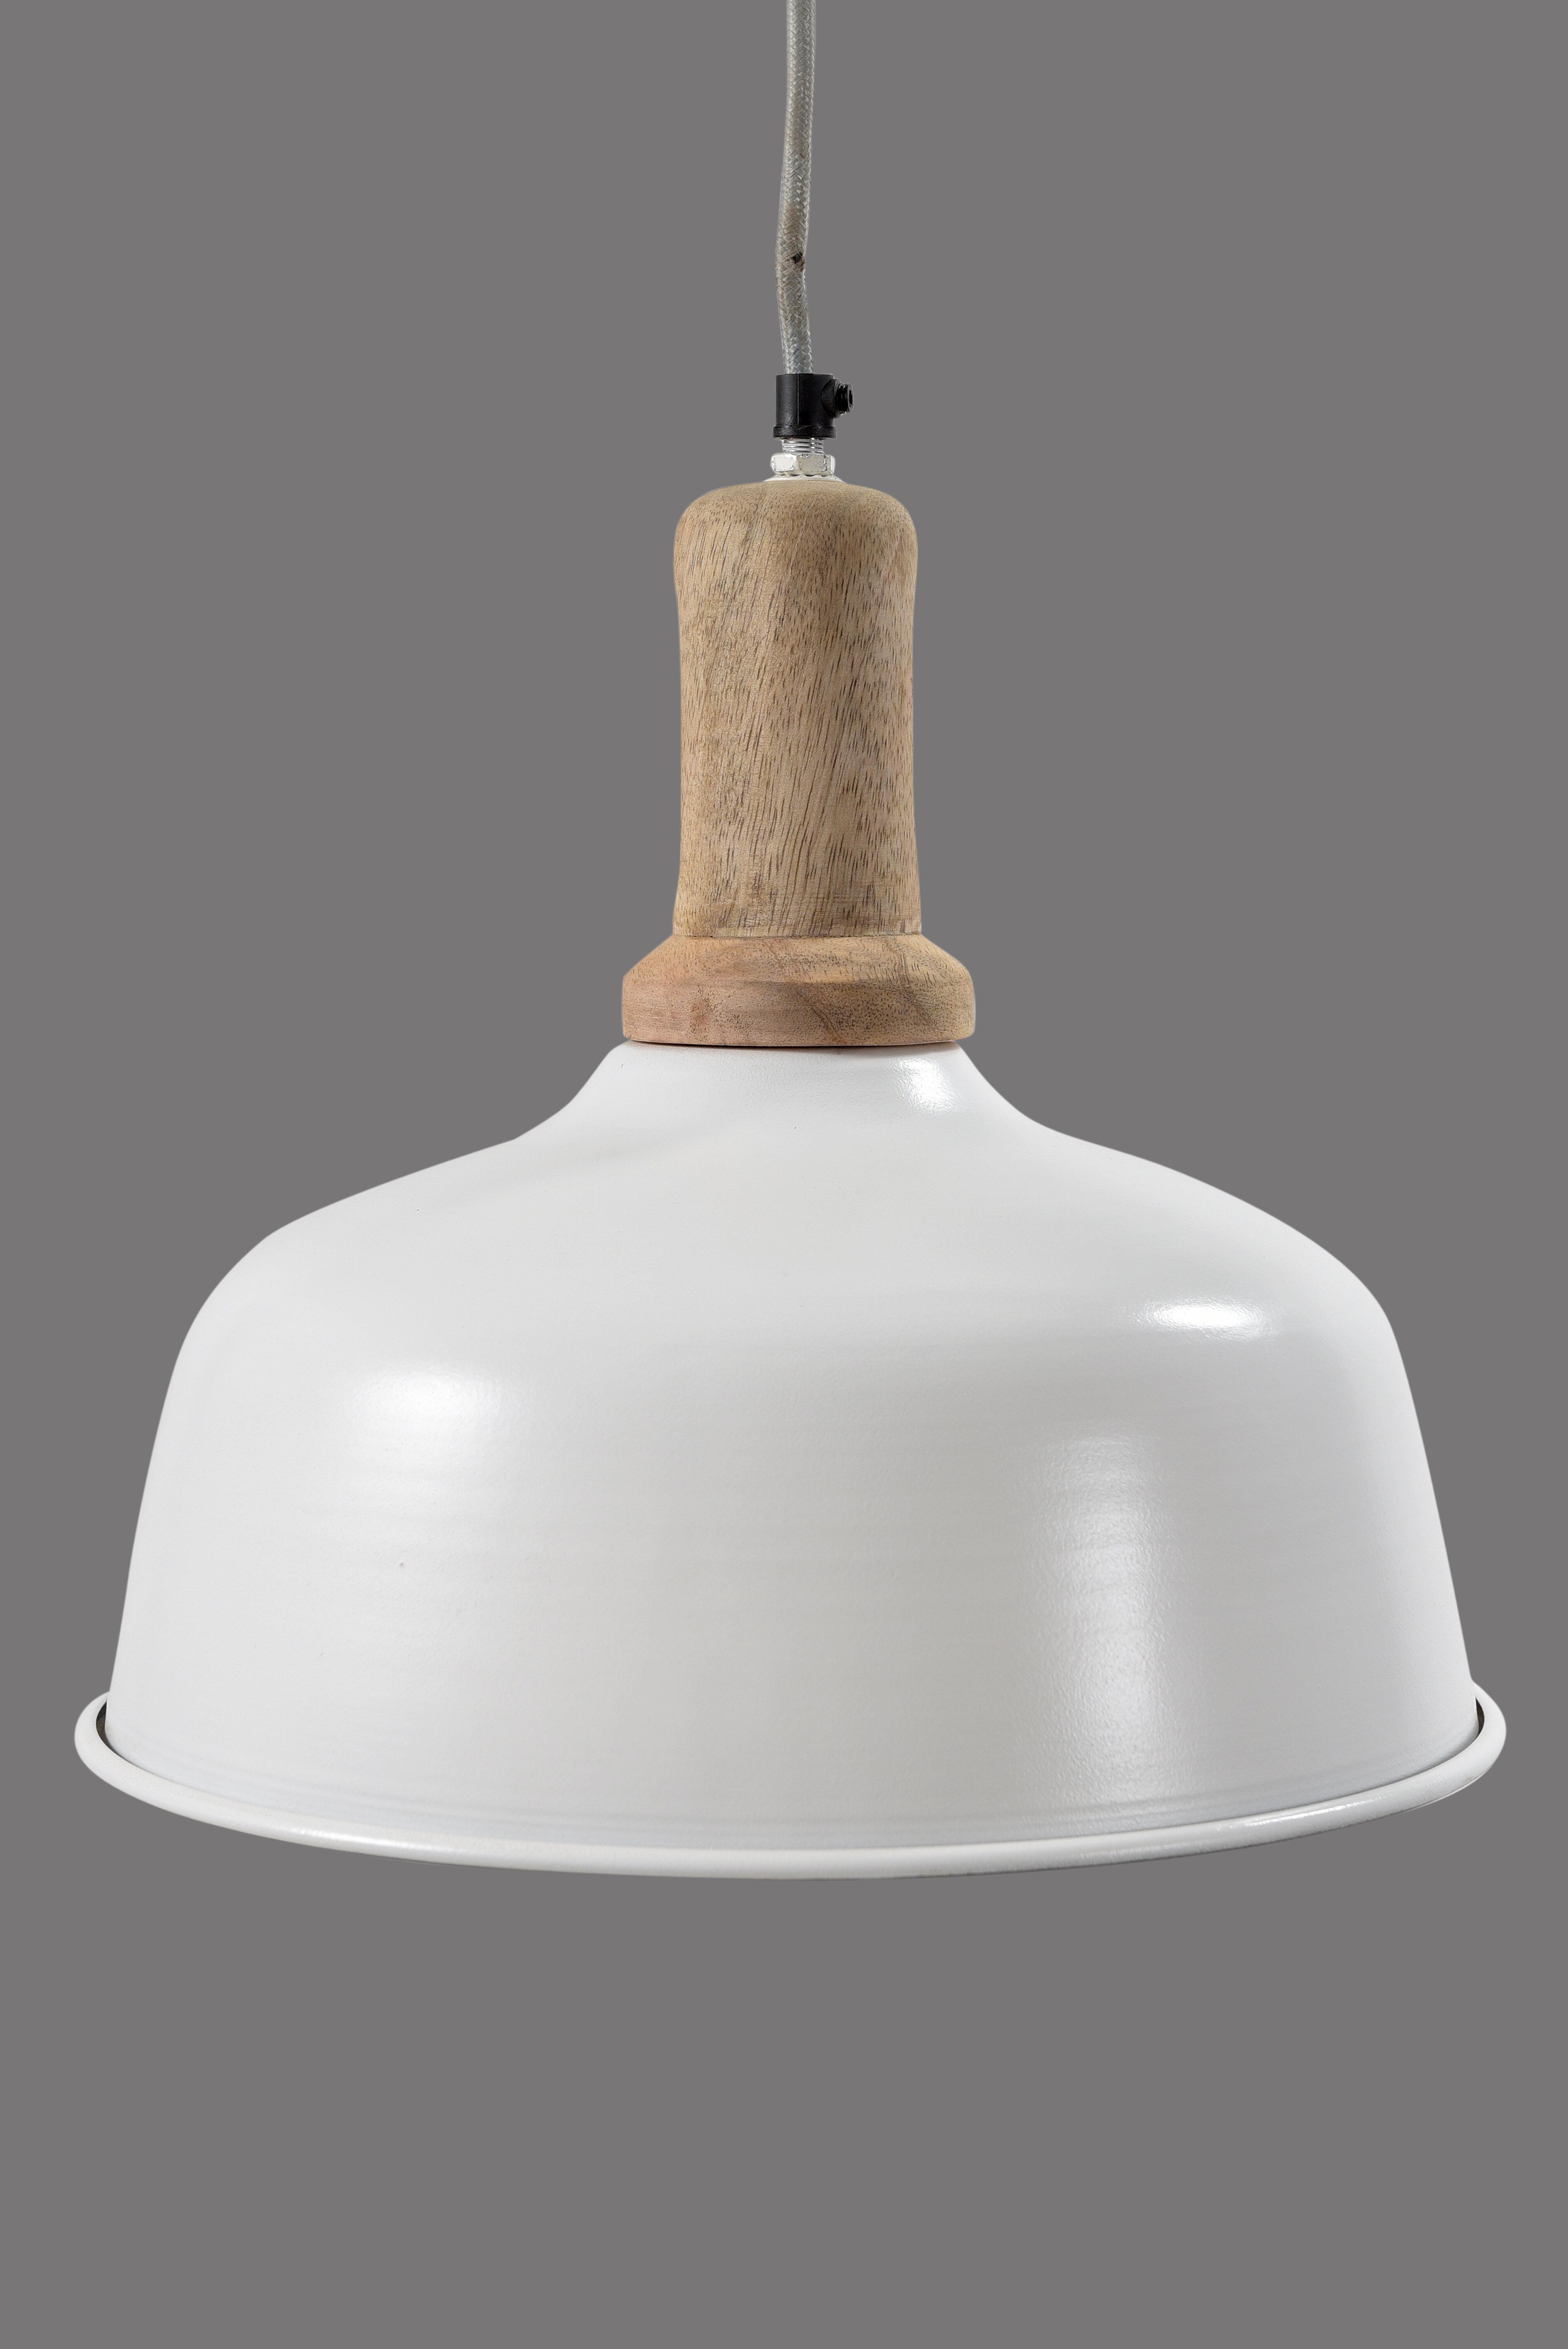 2019 Gattis 1 Light Dome Pendants Pertaining To Glenam 1 Light Single Dome Pendant (View 5 of 20)